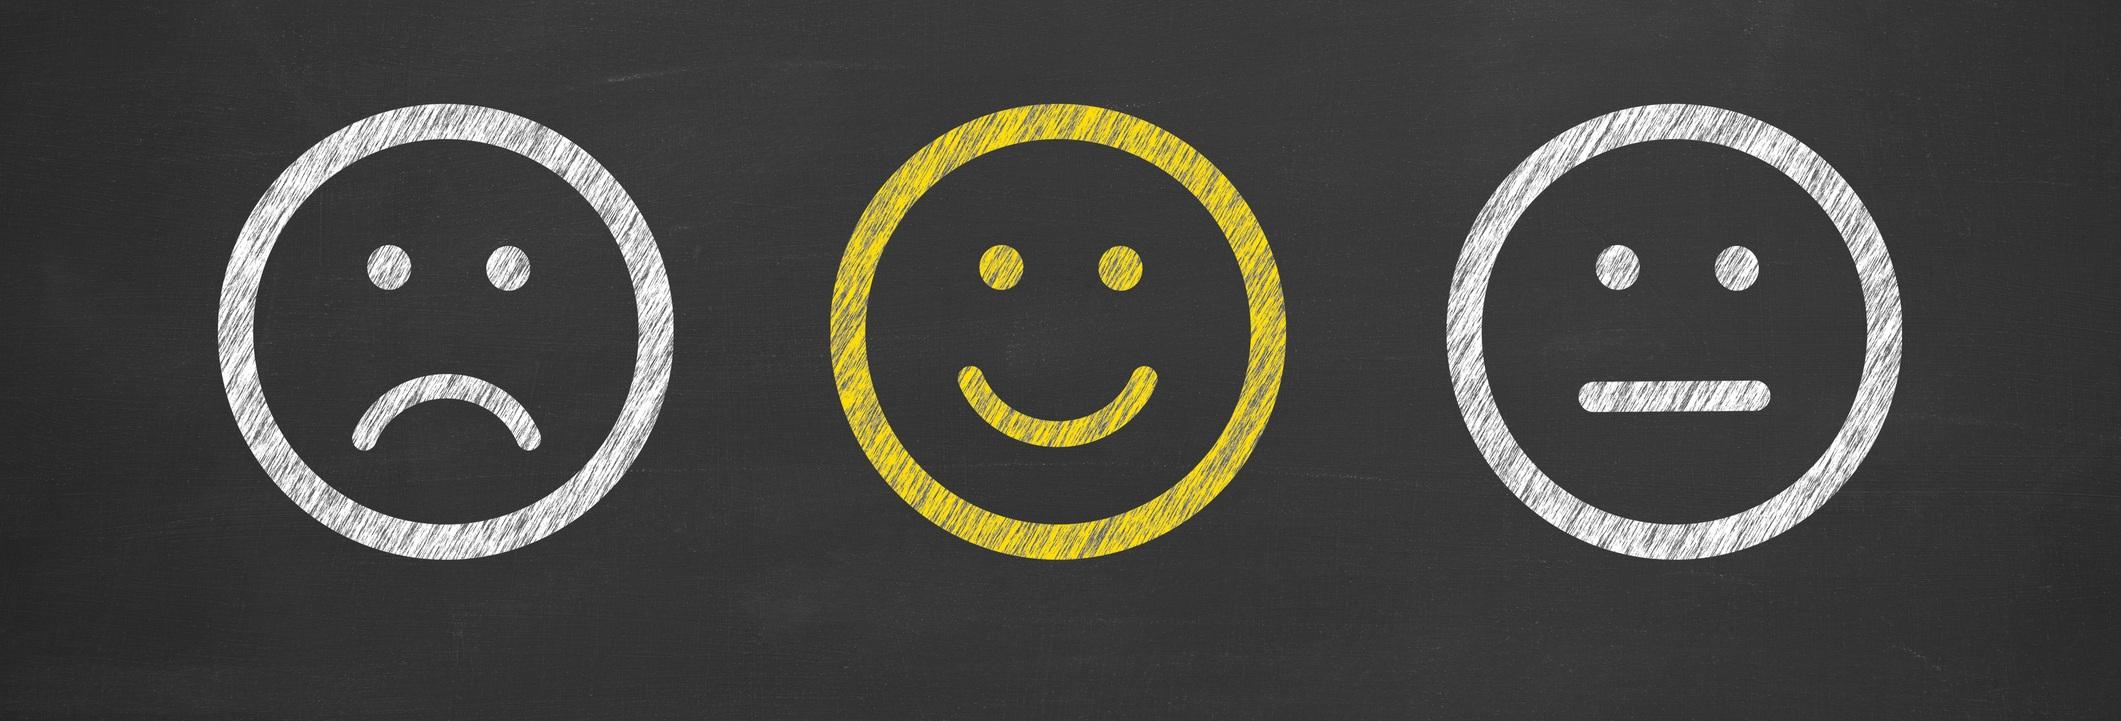 iStock-Emotion+Faces+Chalkboard.jpg